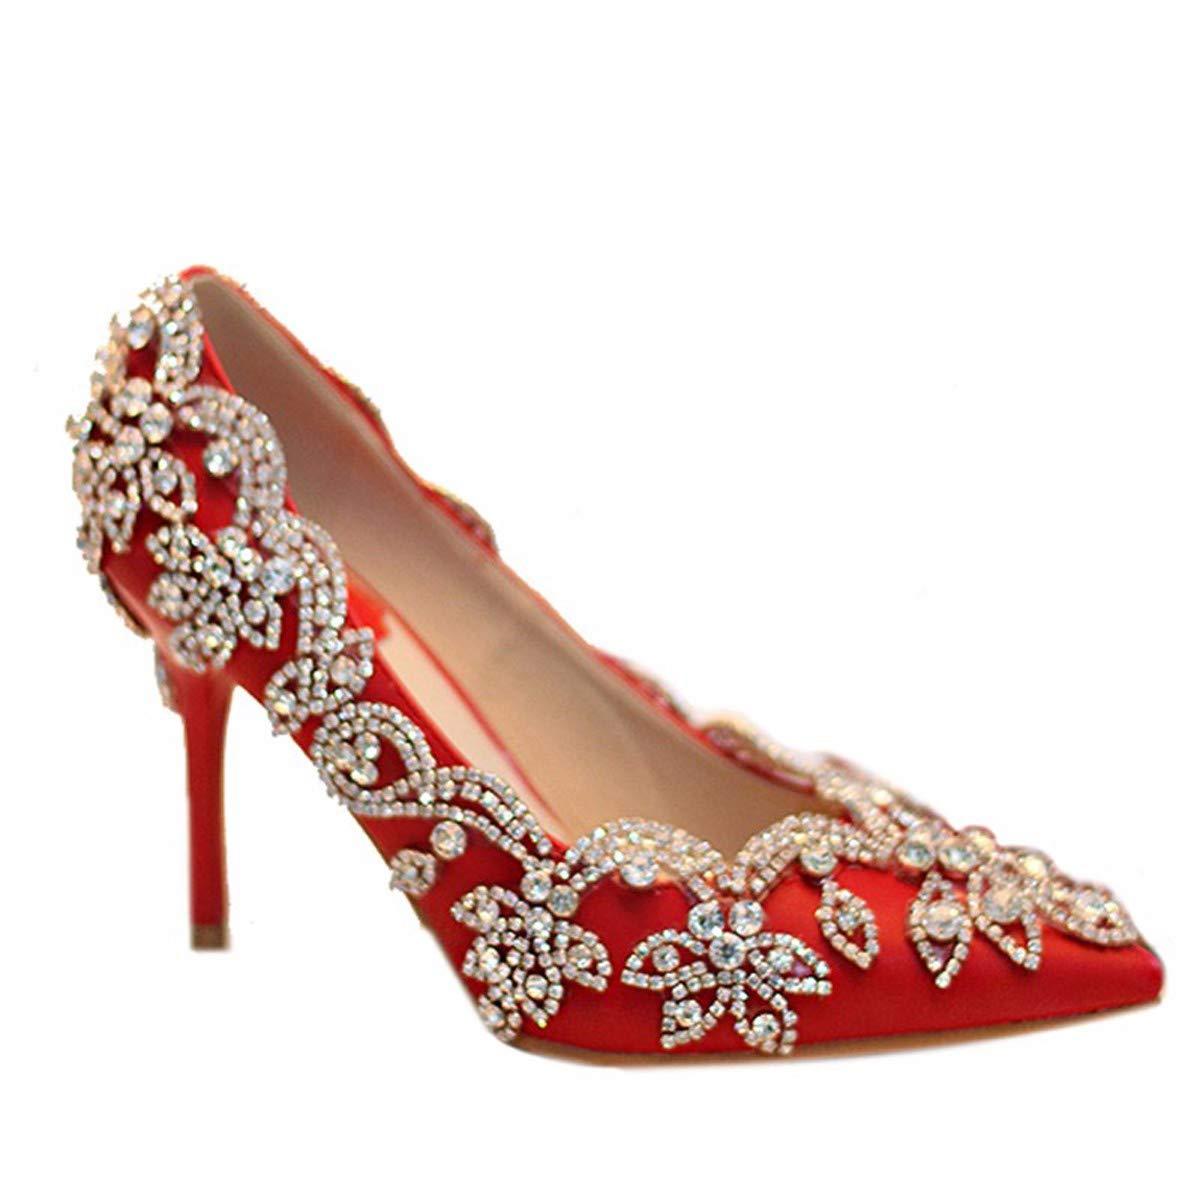 GTVERNH Damenschuhe Rote Braut Schuhe High - Heel Hochzeit Hochzeit Hochzeit Schuhe Dünne Sohle Diamantbohrer Wies Kopf 9Cm Kristall - Schuhe Mode. 99c9cc